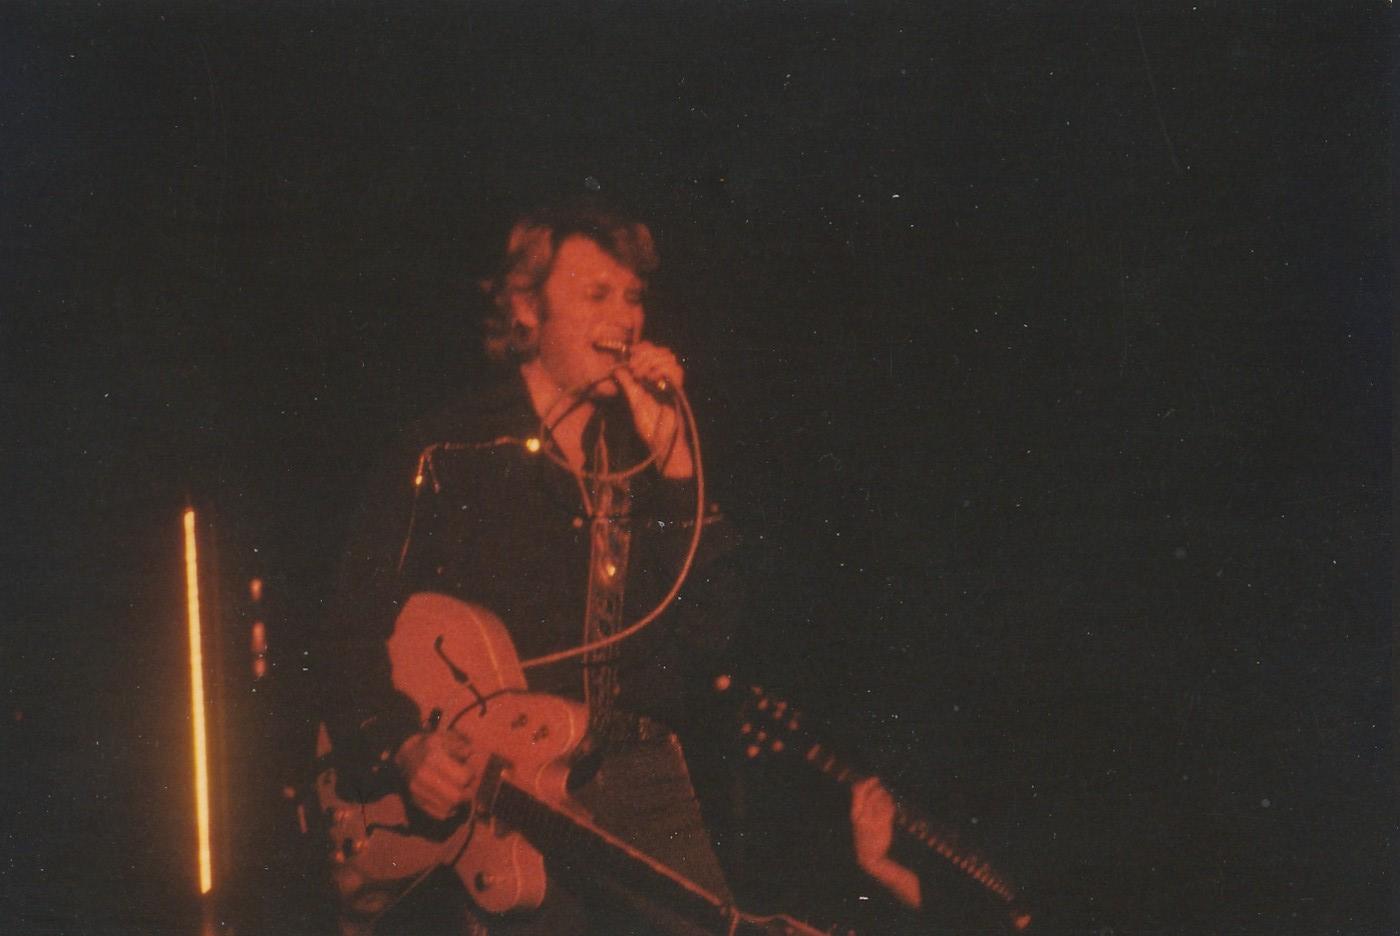 INÉDIT  :  JOHNNY HALLYDAY EN TOURNEE - HIVER 1978 -1979 ( PHOTOS INÉDITES )   Img_2629